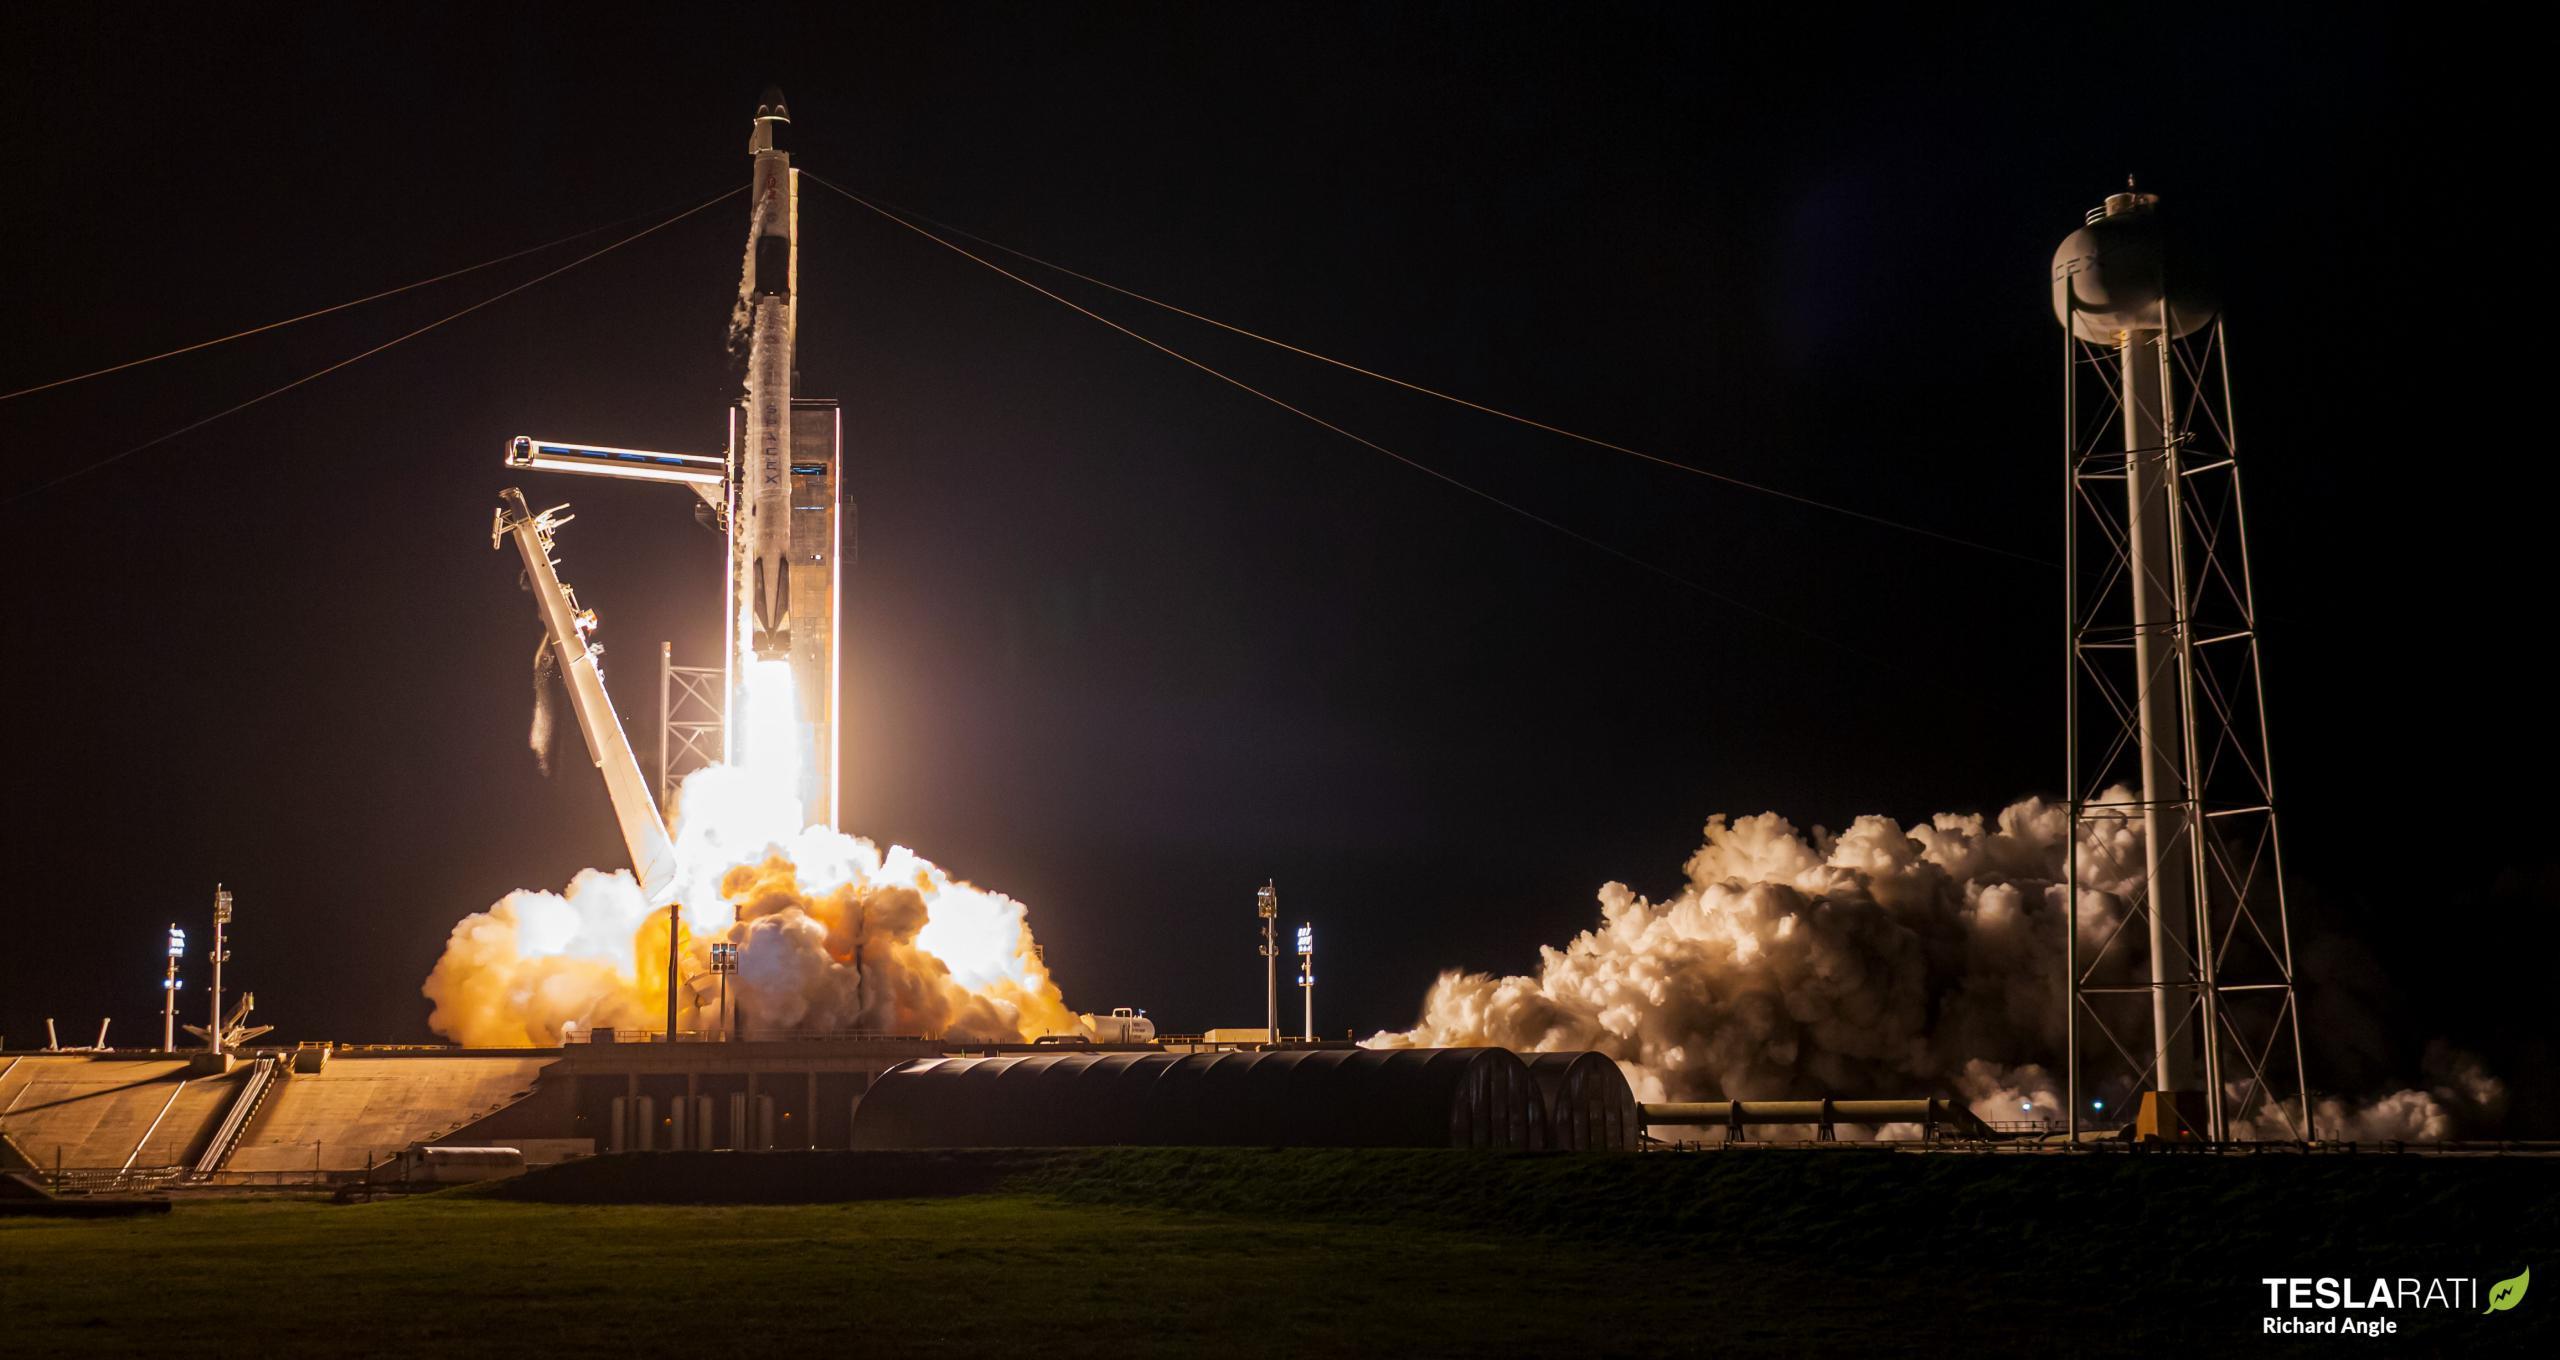 Crew-2 Crew Dragon C206 Falcon 9 B1061 39A 042321 (Richard Angle) launch 1 crop (c)